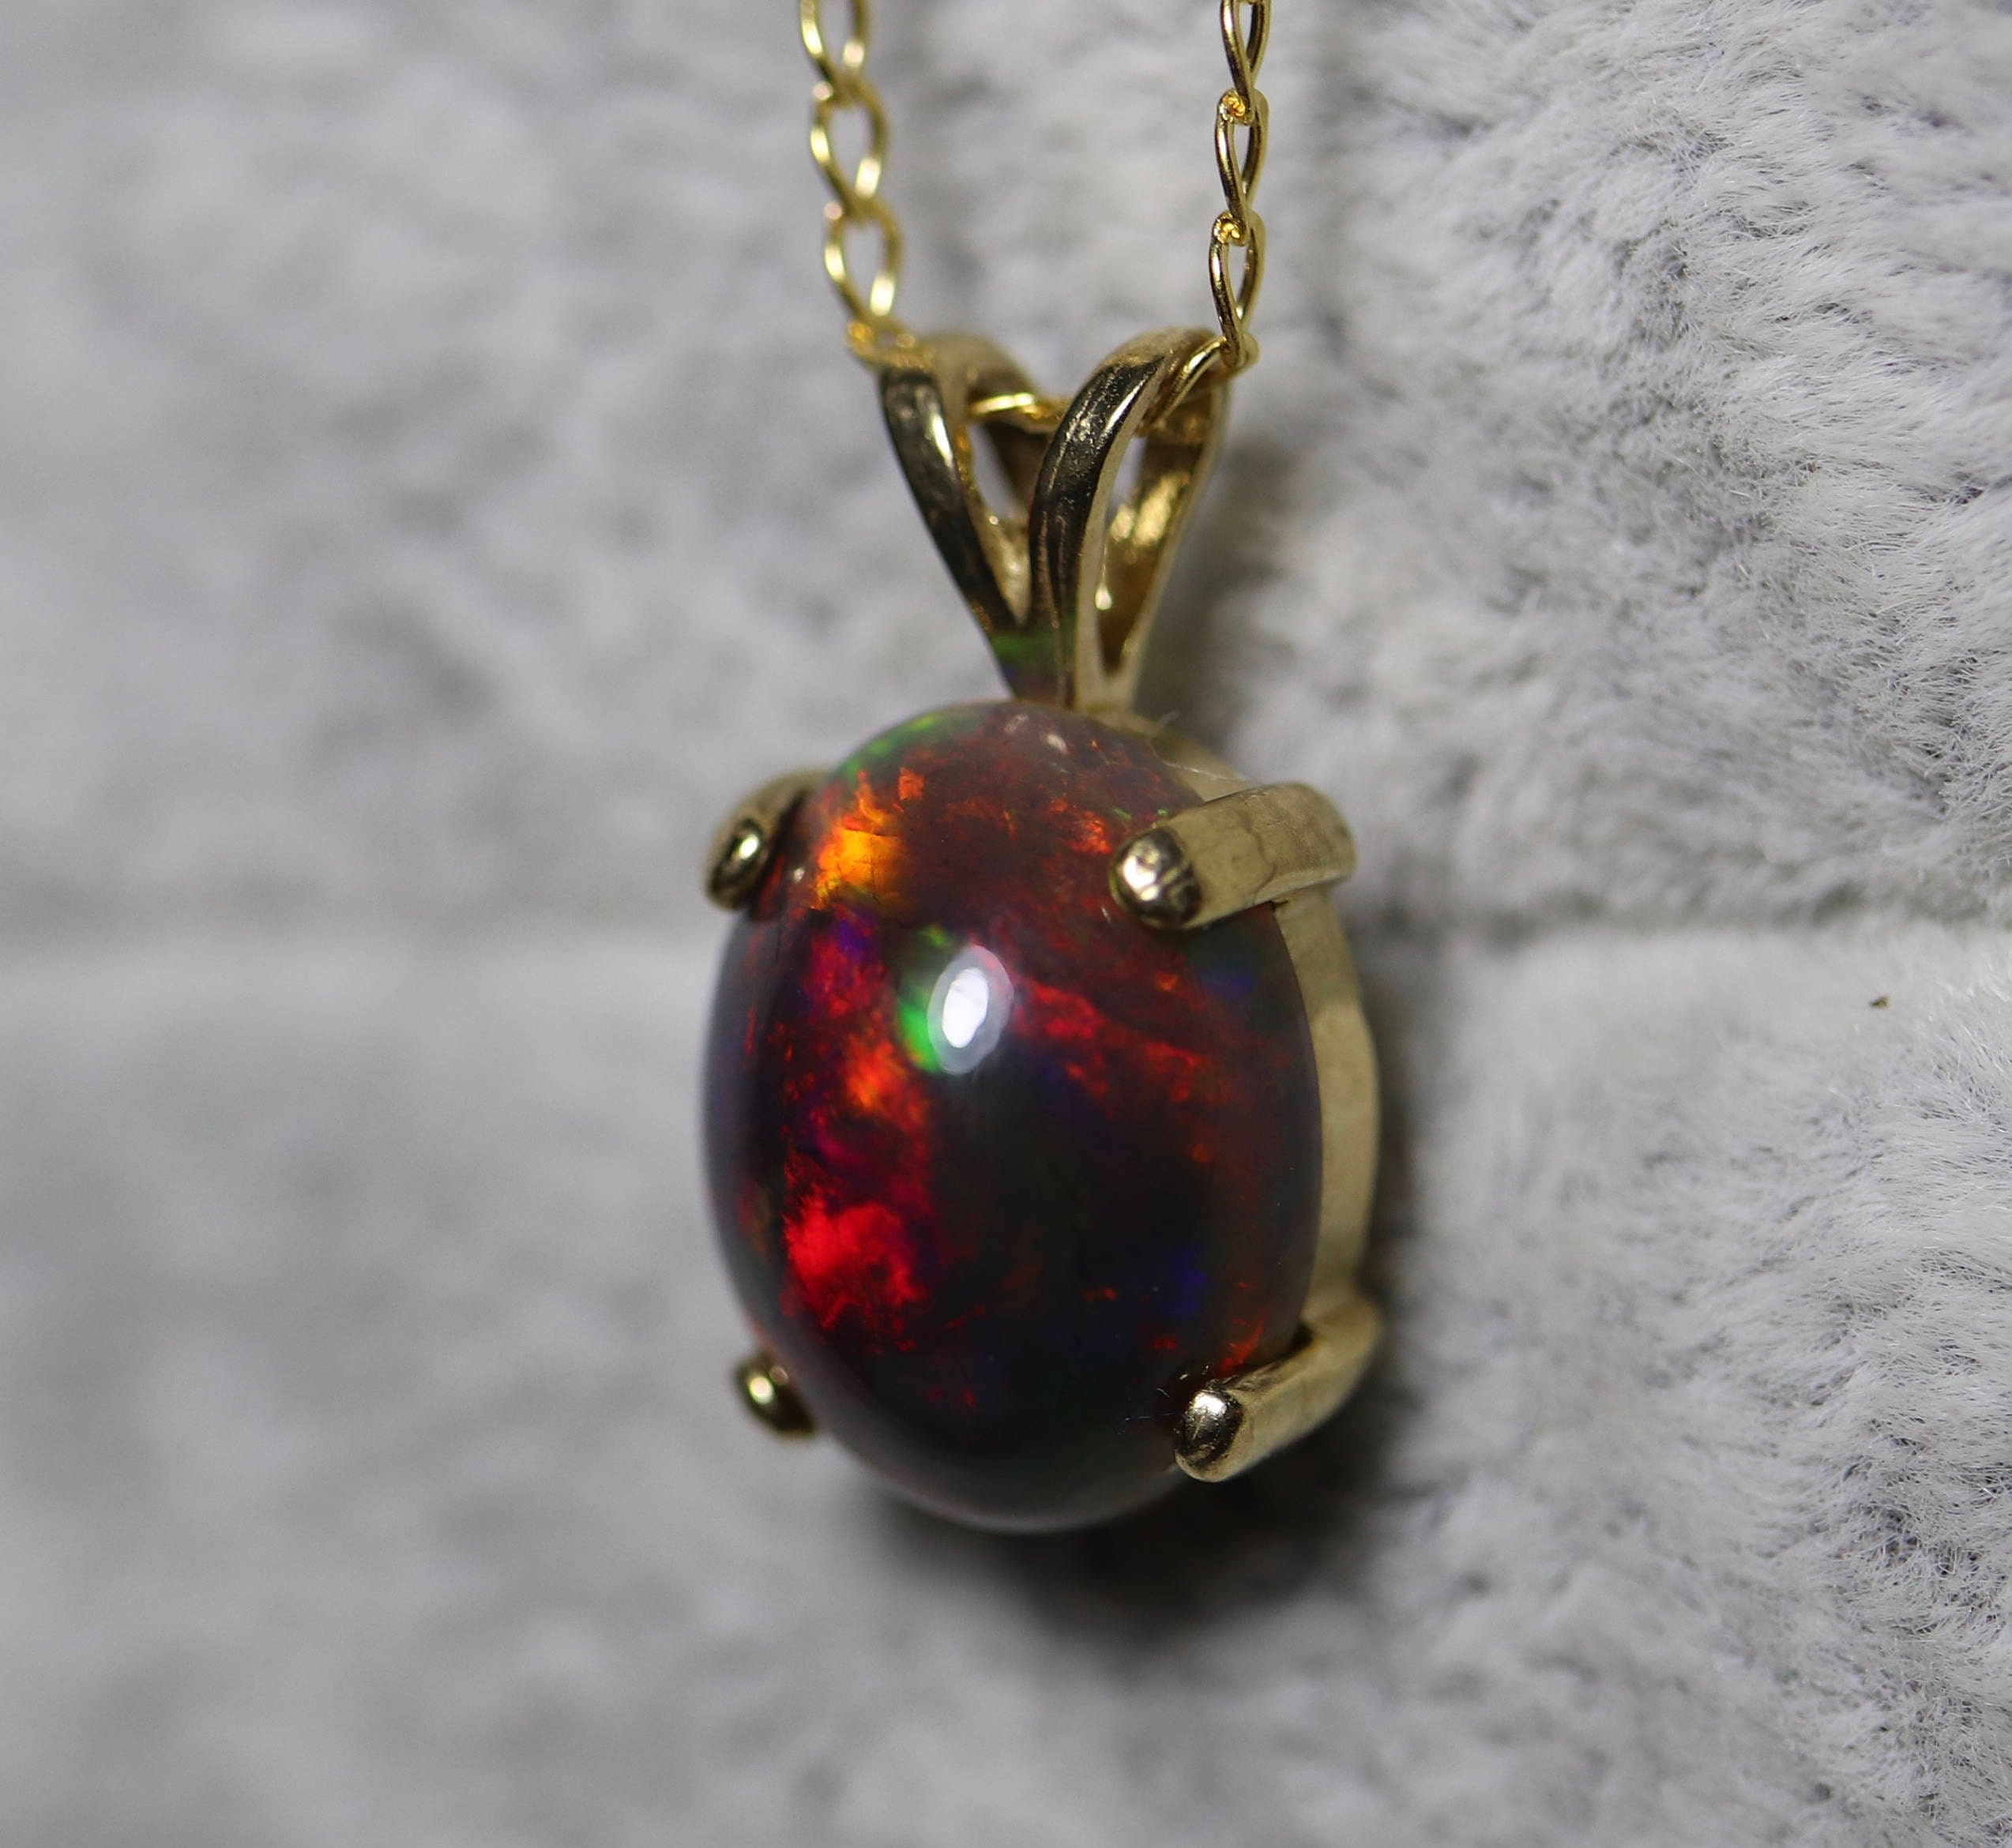 Black opal necklace black opal pendant black fire opal necklace fire opal necklace solid black opal necklace 1 aloadofball Gallery